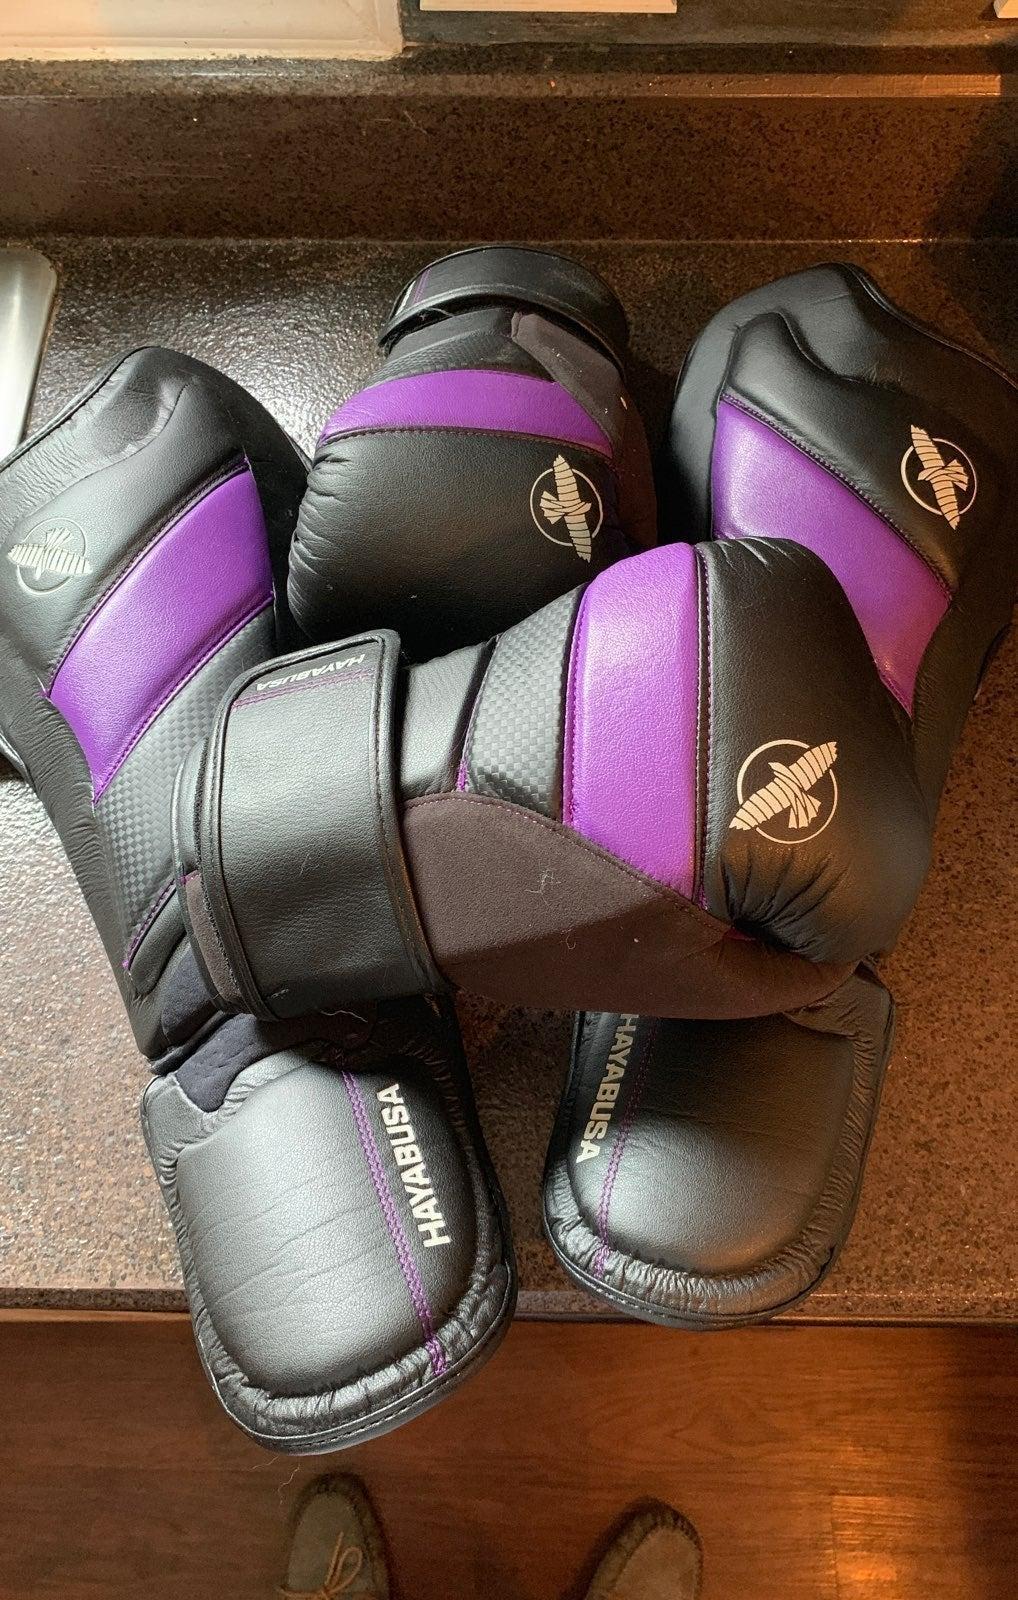 Hayabusa Shin Guards and Gloves